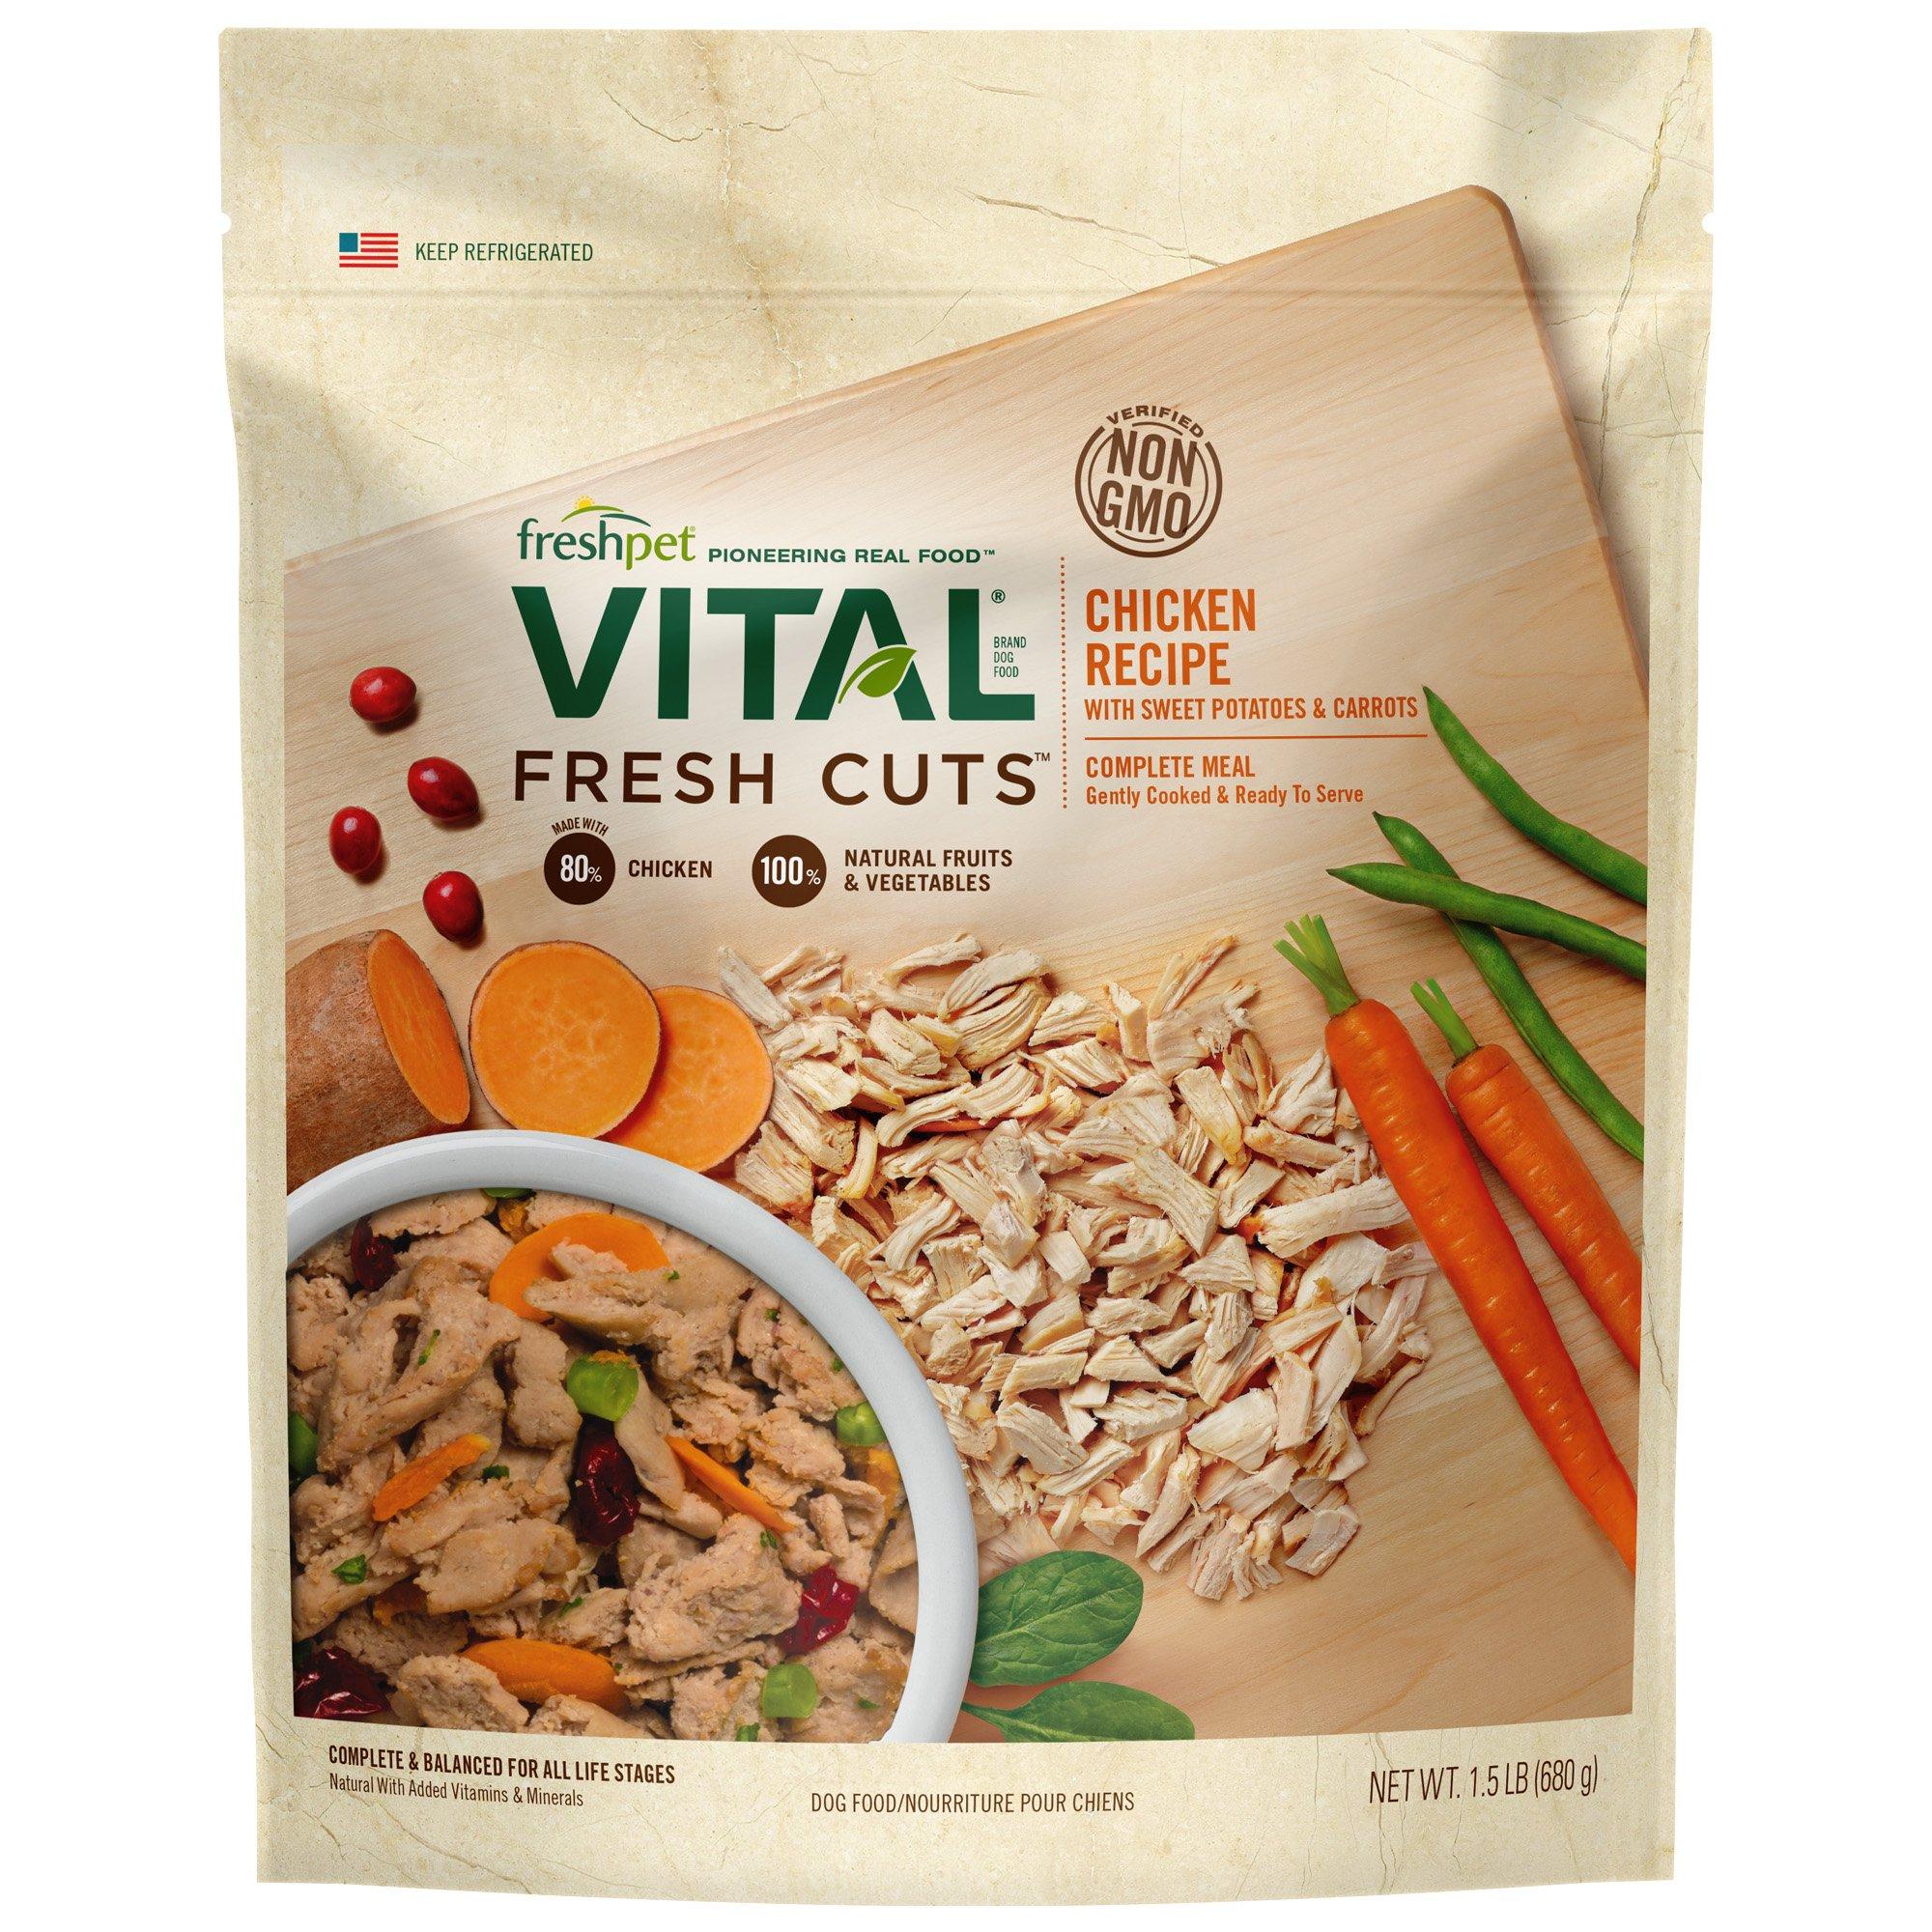 Petco Freshpet Vital Cat Food